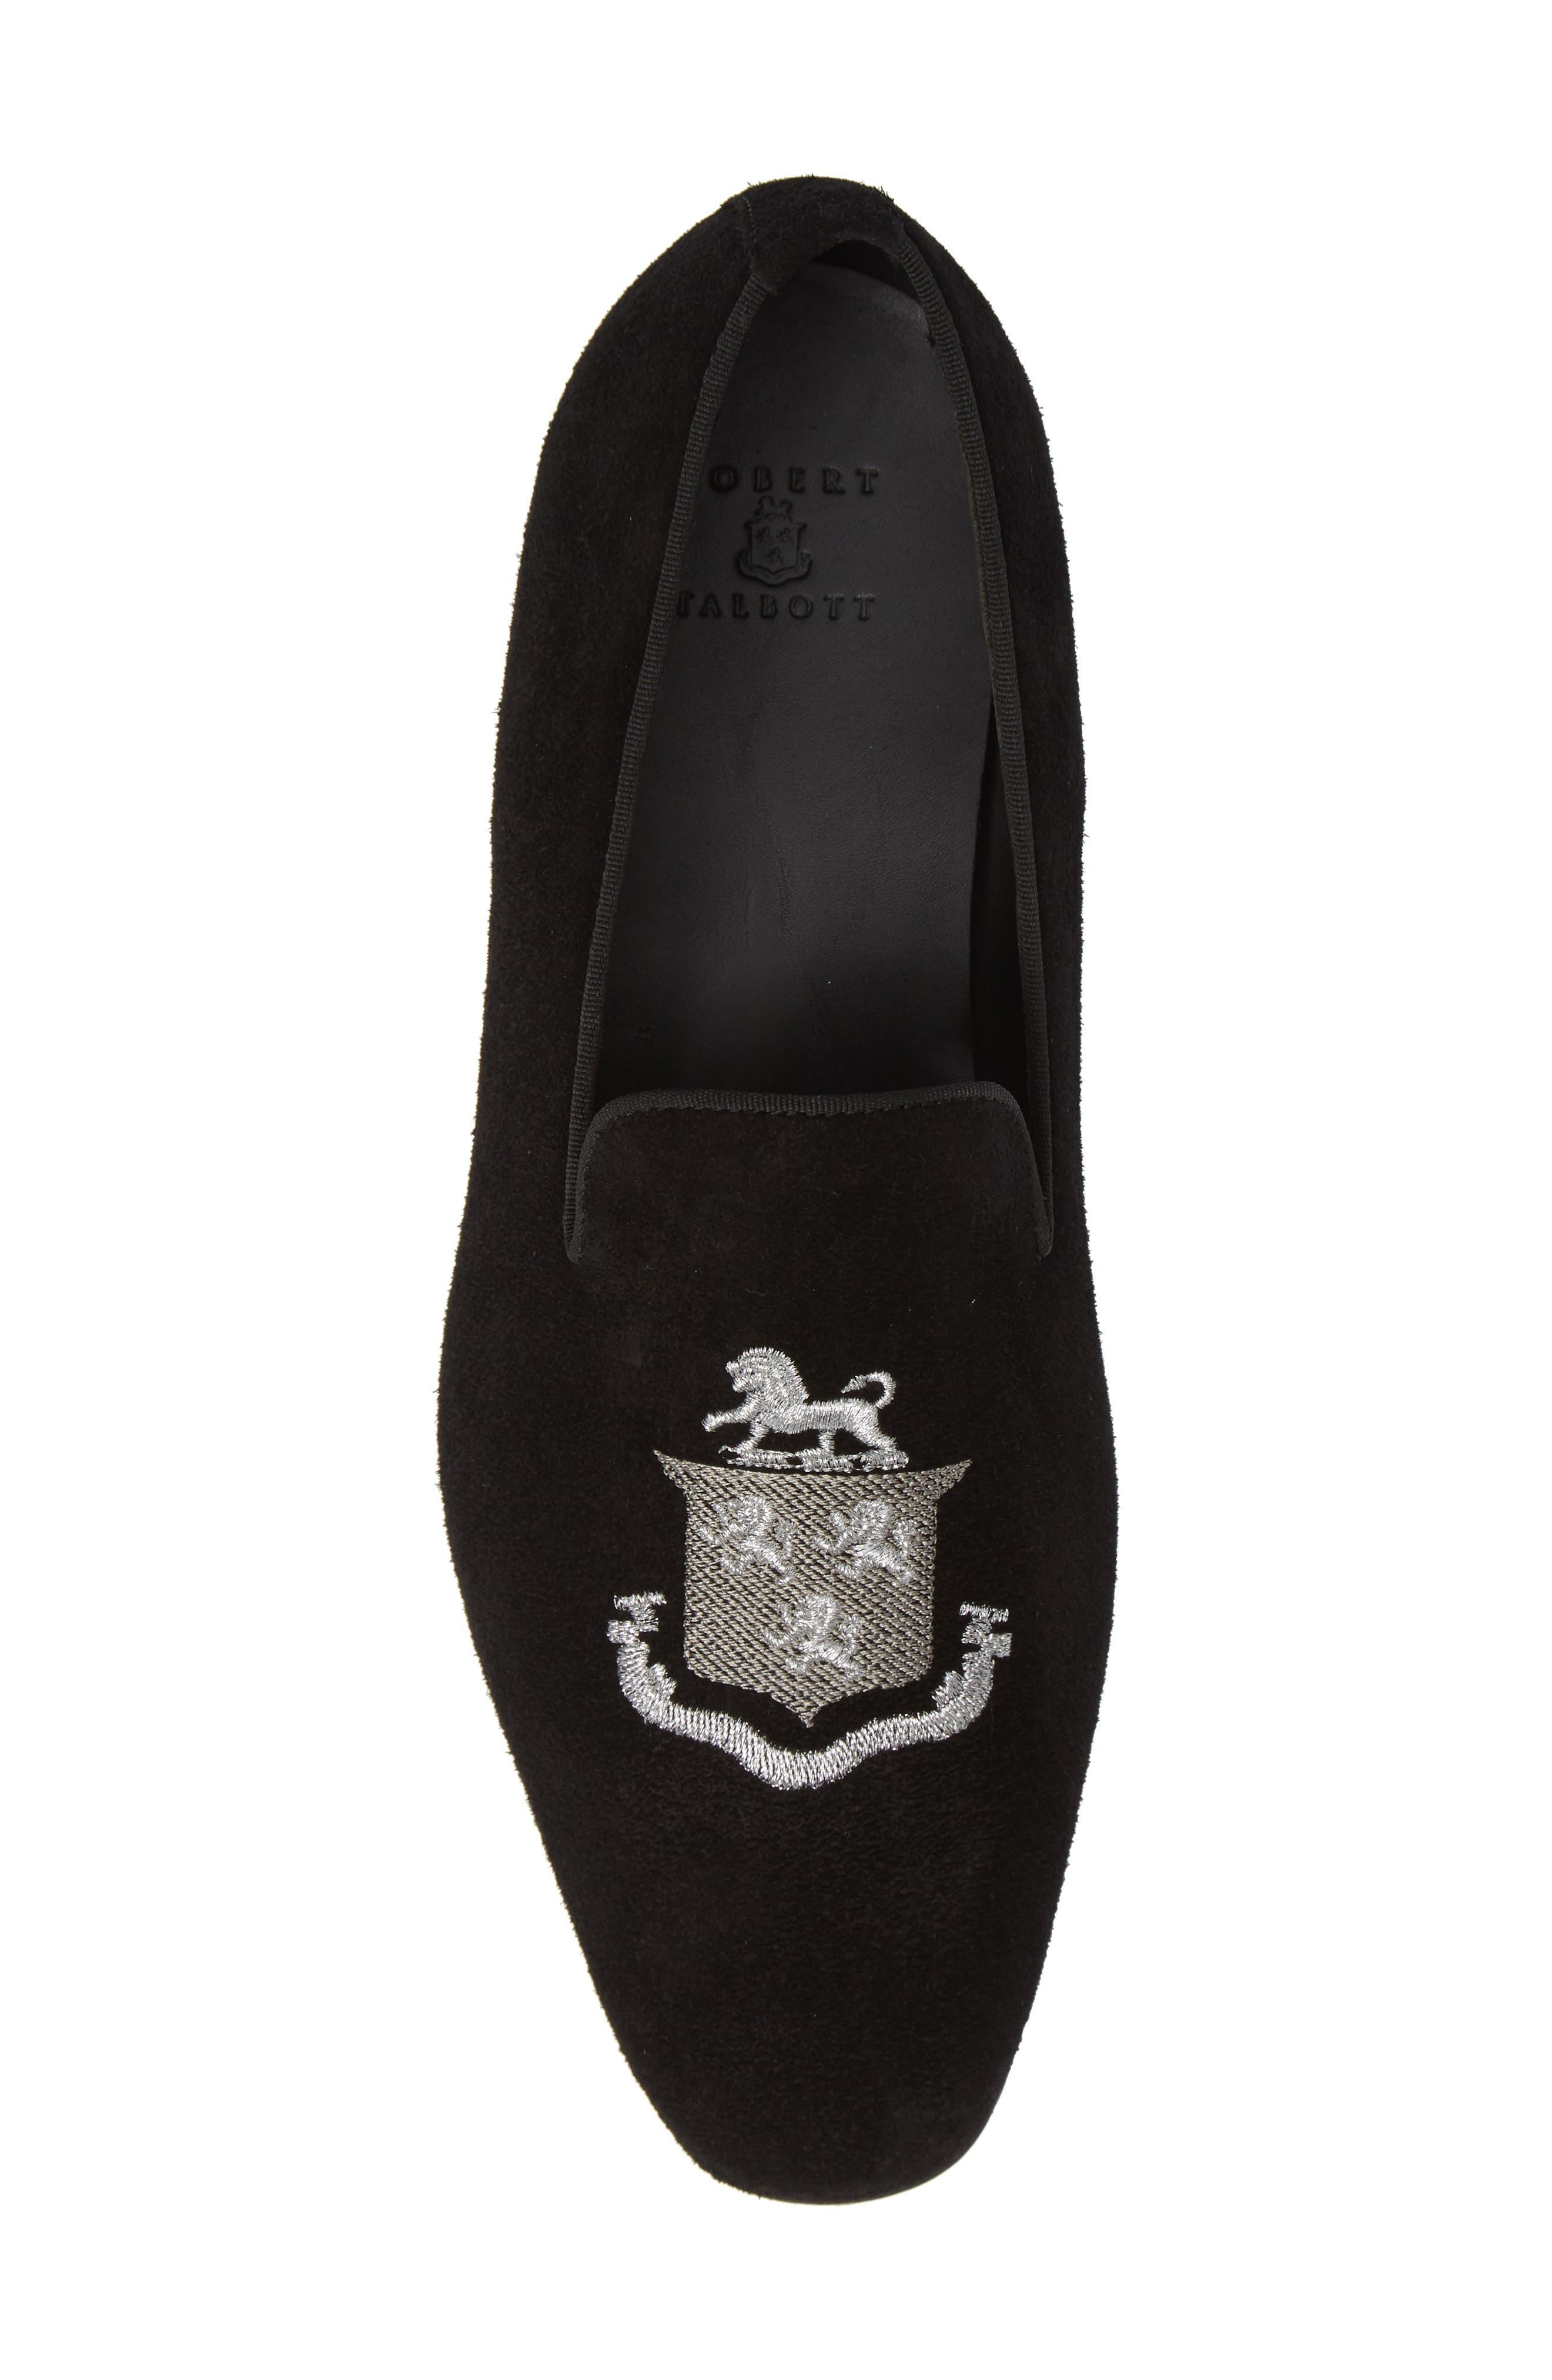 Altos Embroidered Venetian Loafer,                             Alternate thumbnail 5, color,                             BLACK SUEDE